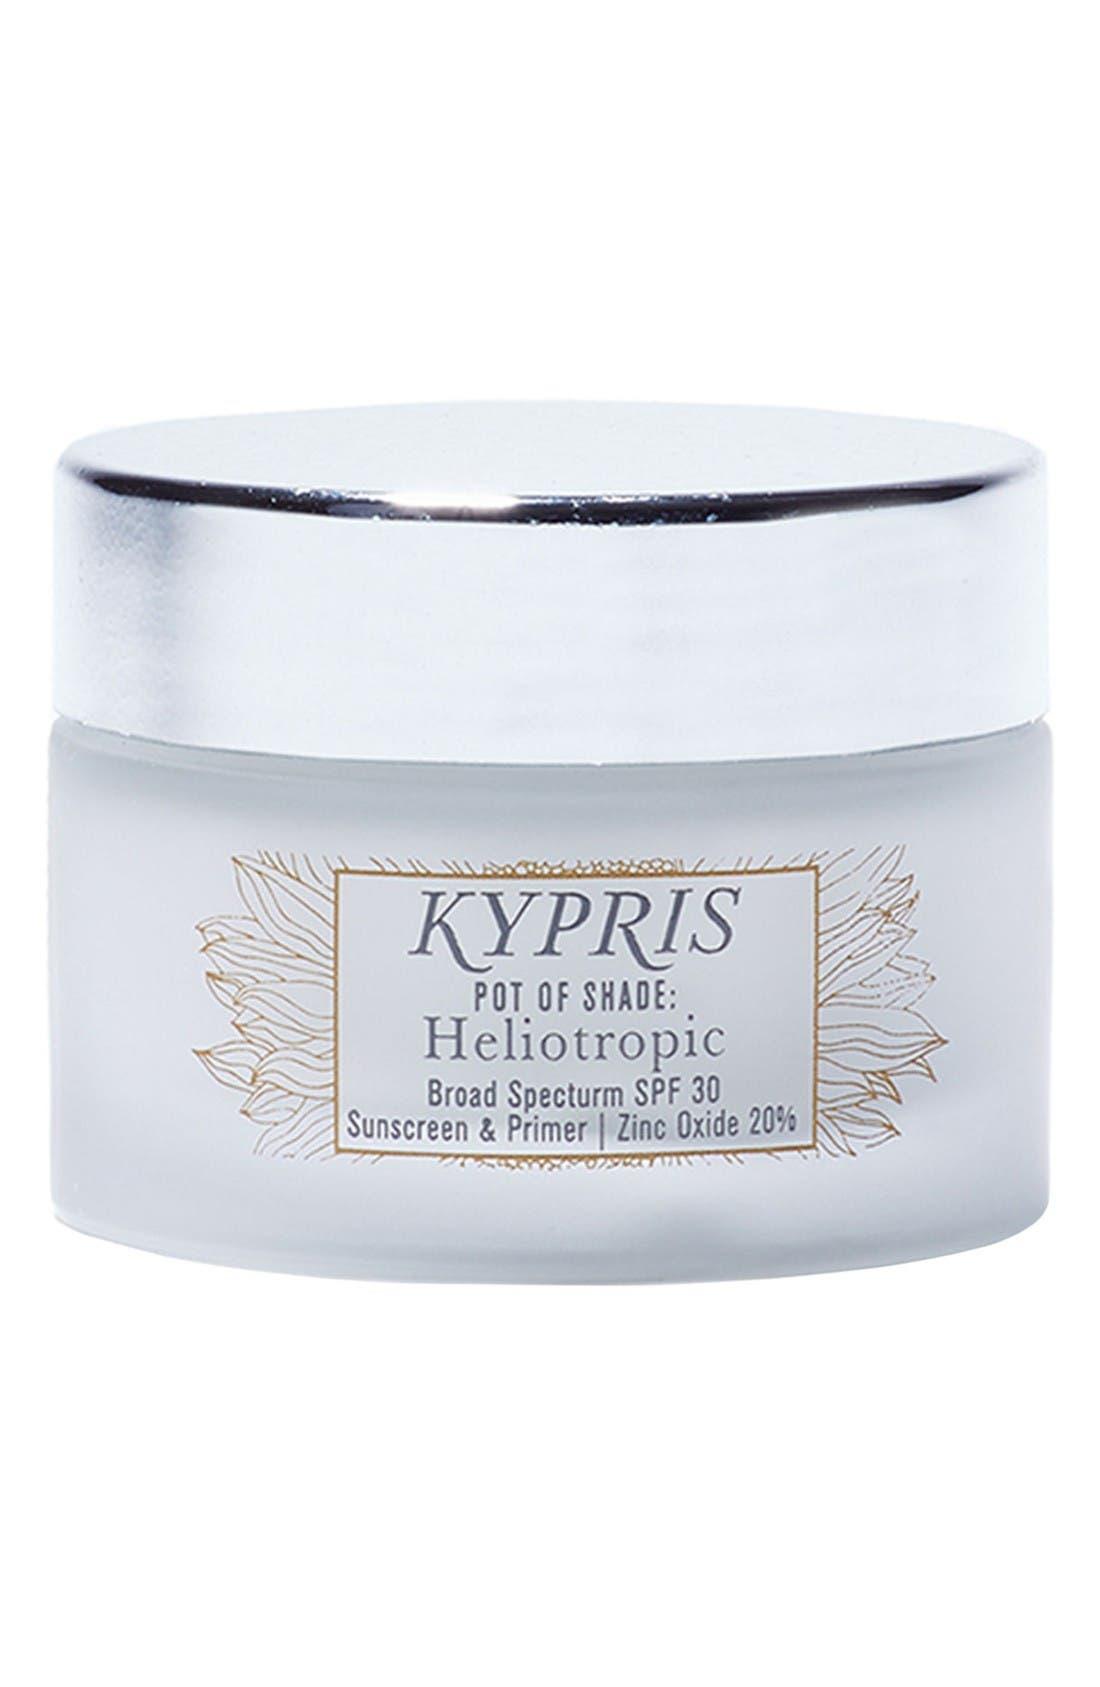 KYPRIS Beauty Pot of Shade Heliotropic Treatment Primer SPF 30